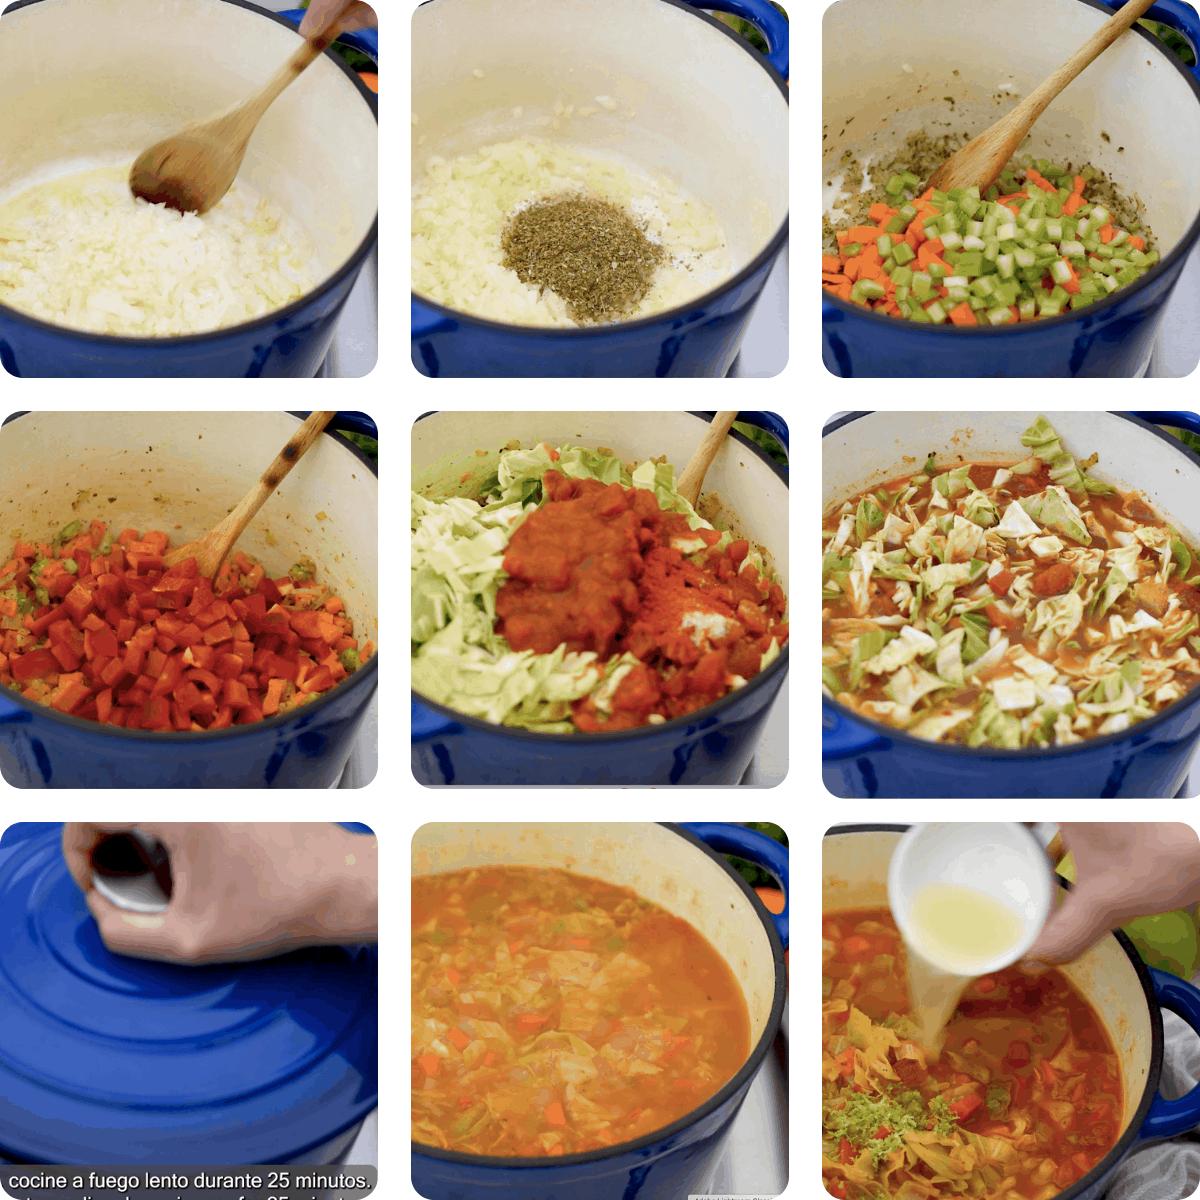 Receta para preparar sopa de col paso a paso